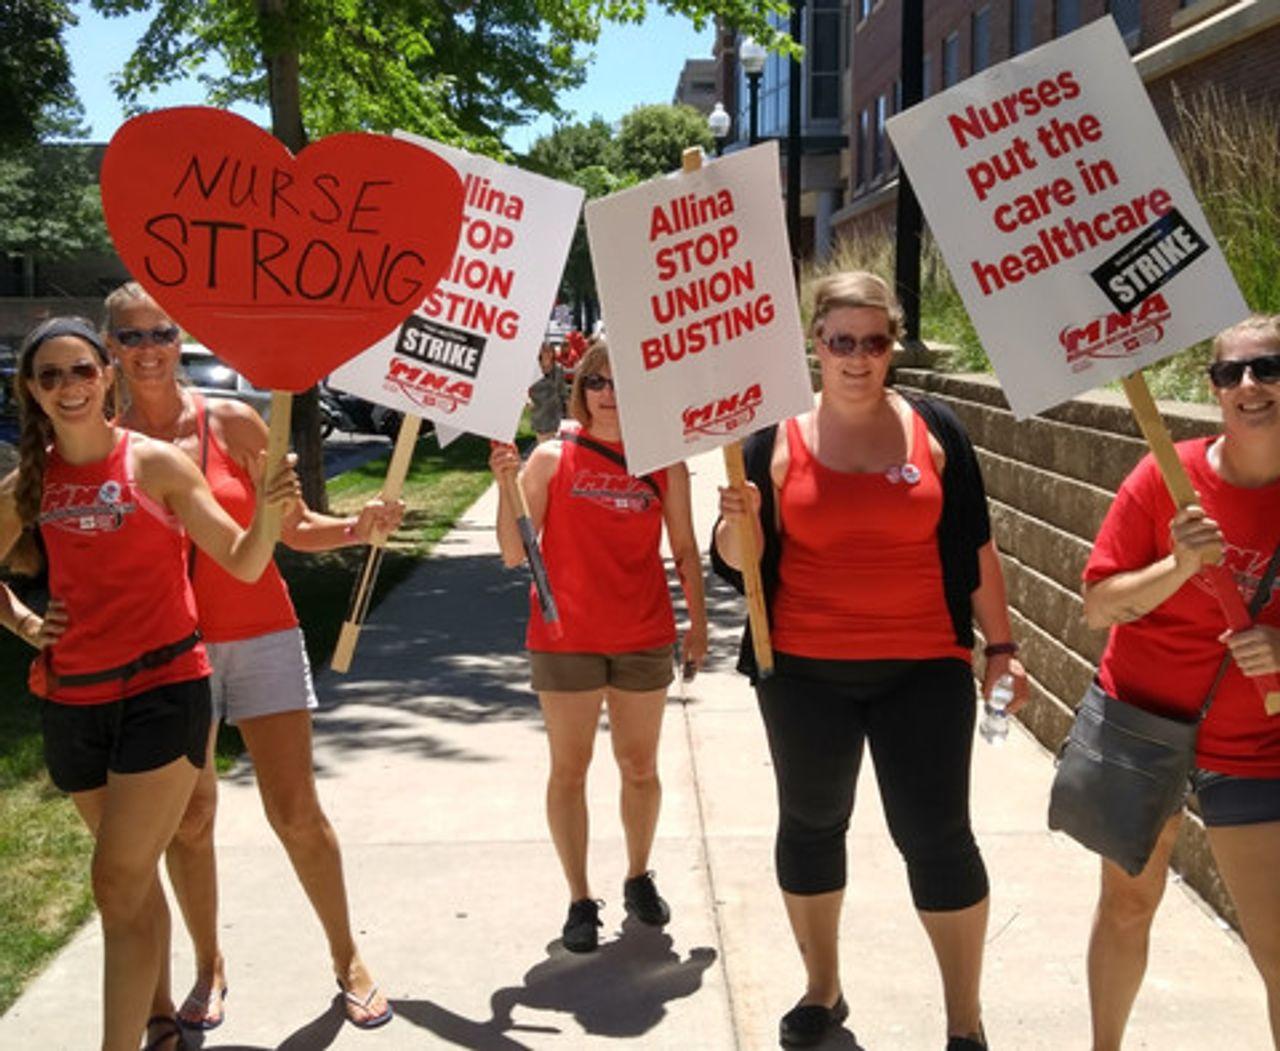 Striking Minnesota nurses reject Allina's contract proposal